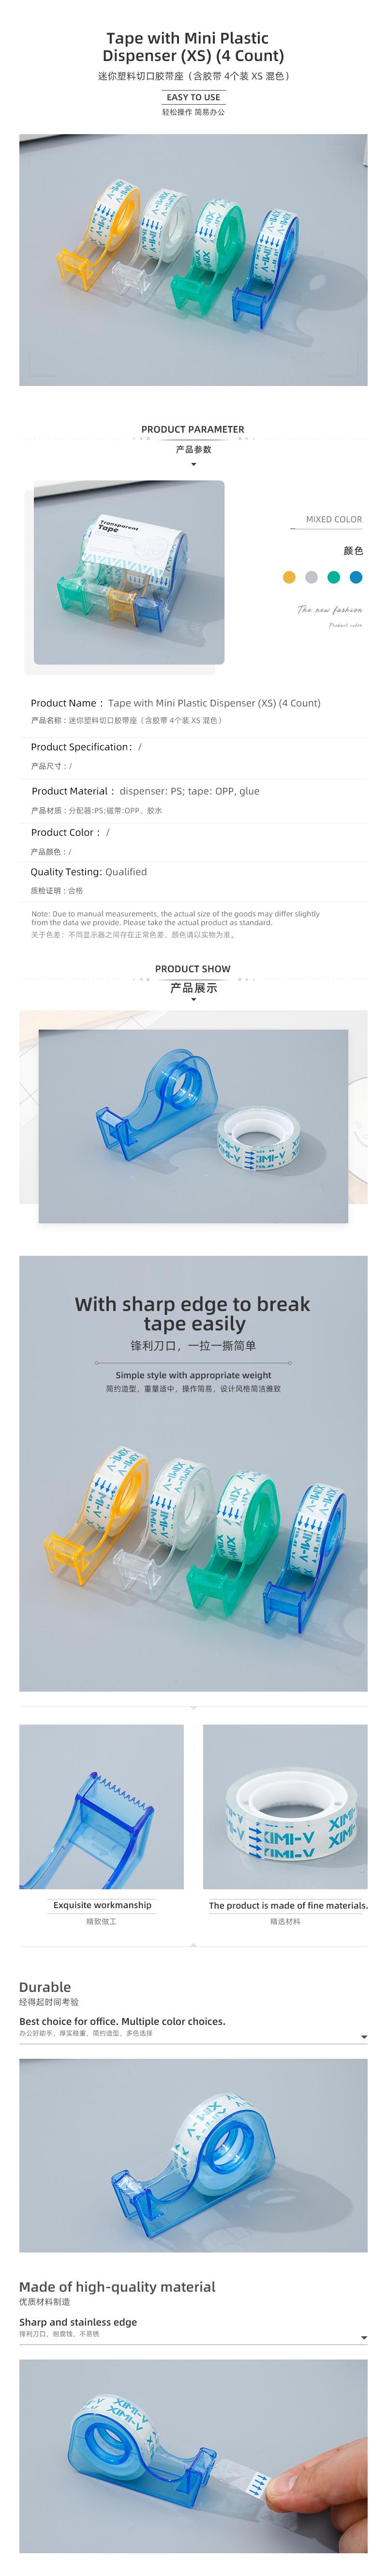 Tape with Mini Plastic Dispenser (XS) (4 Count) /></p> </div> </div> </div> <div class=